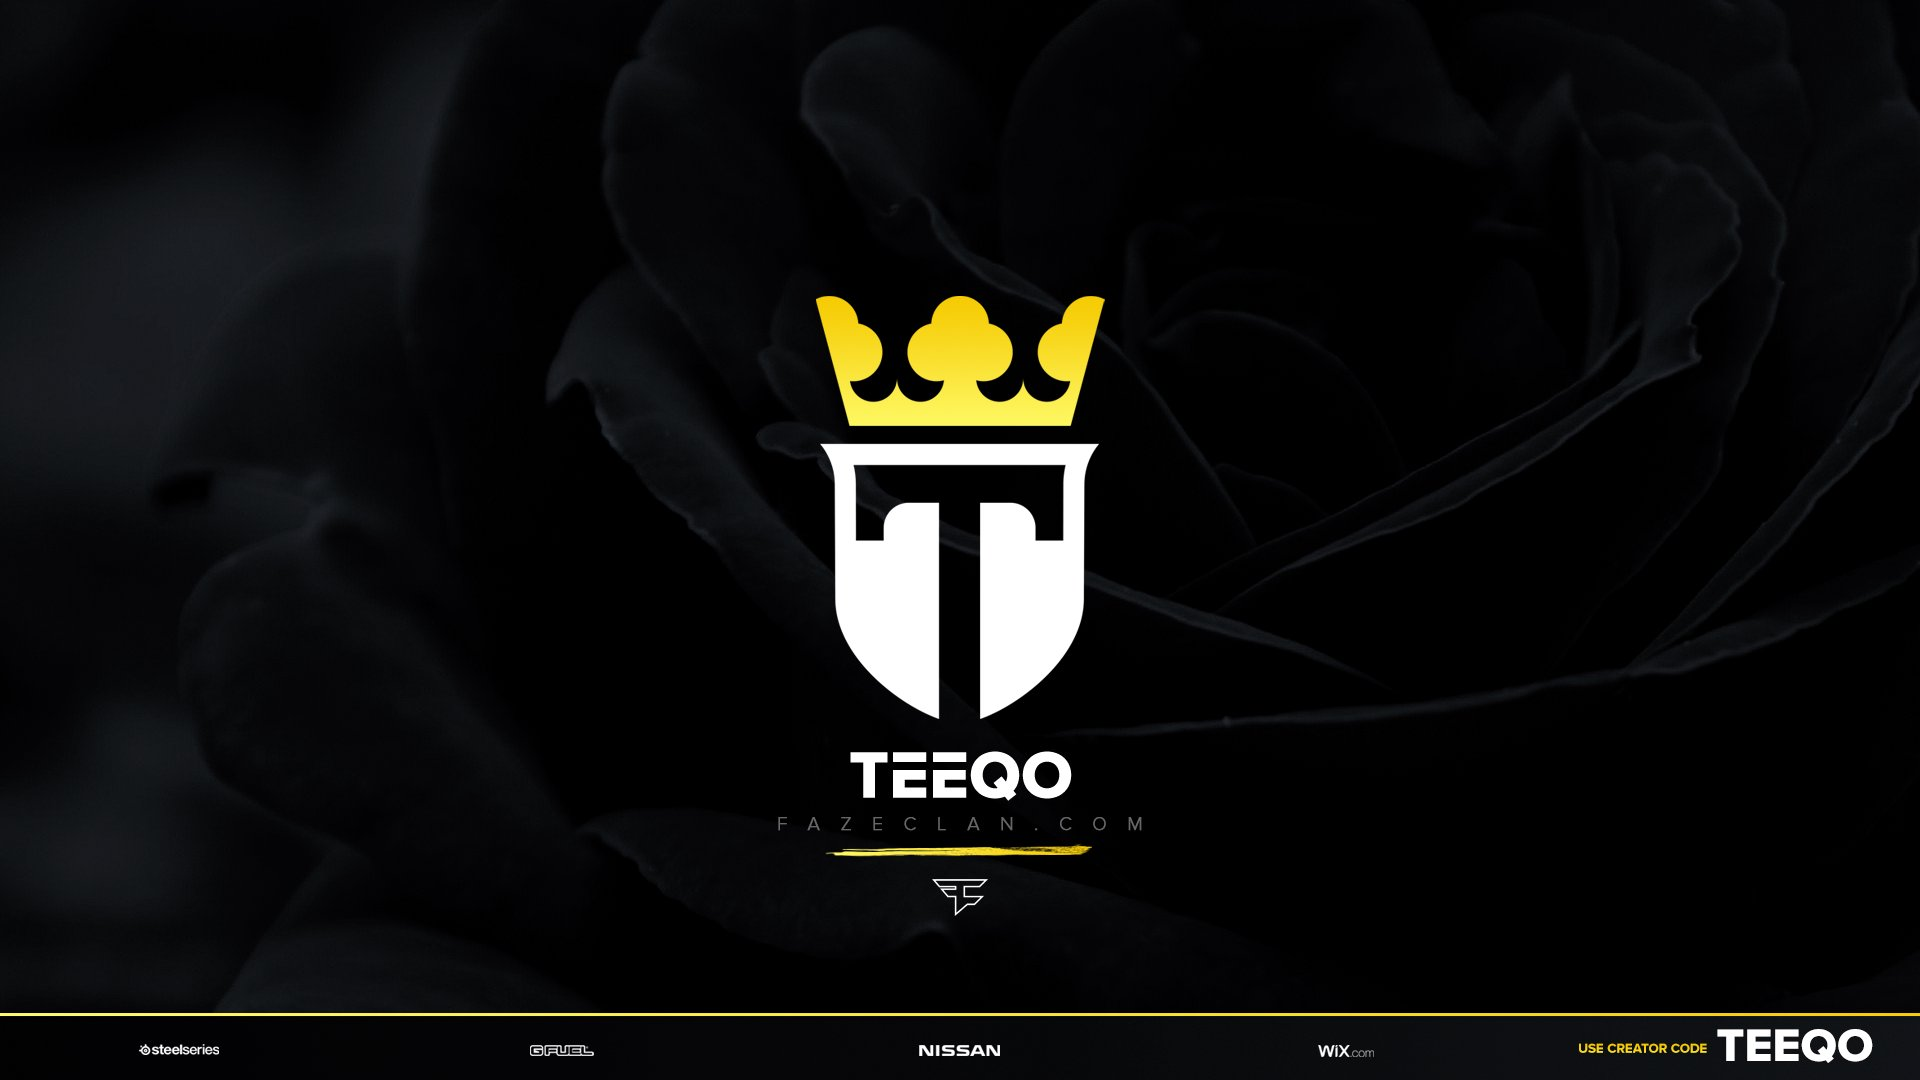 Twitch stream of Teeqo